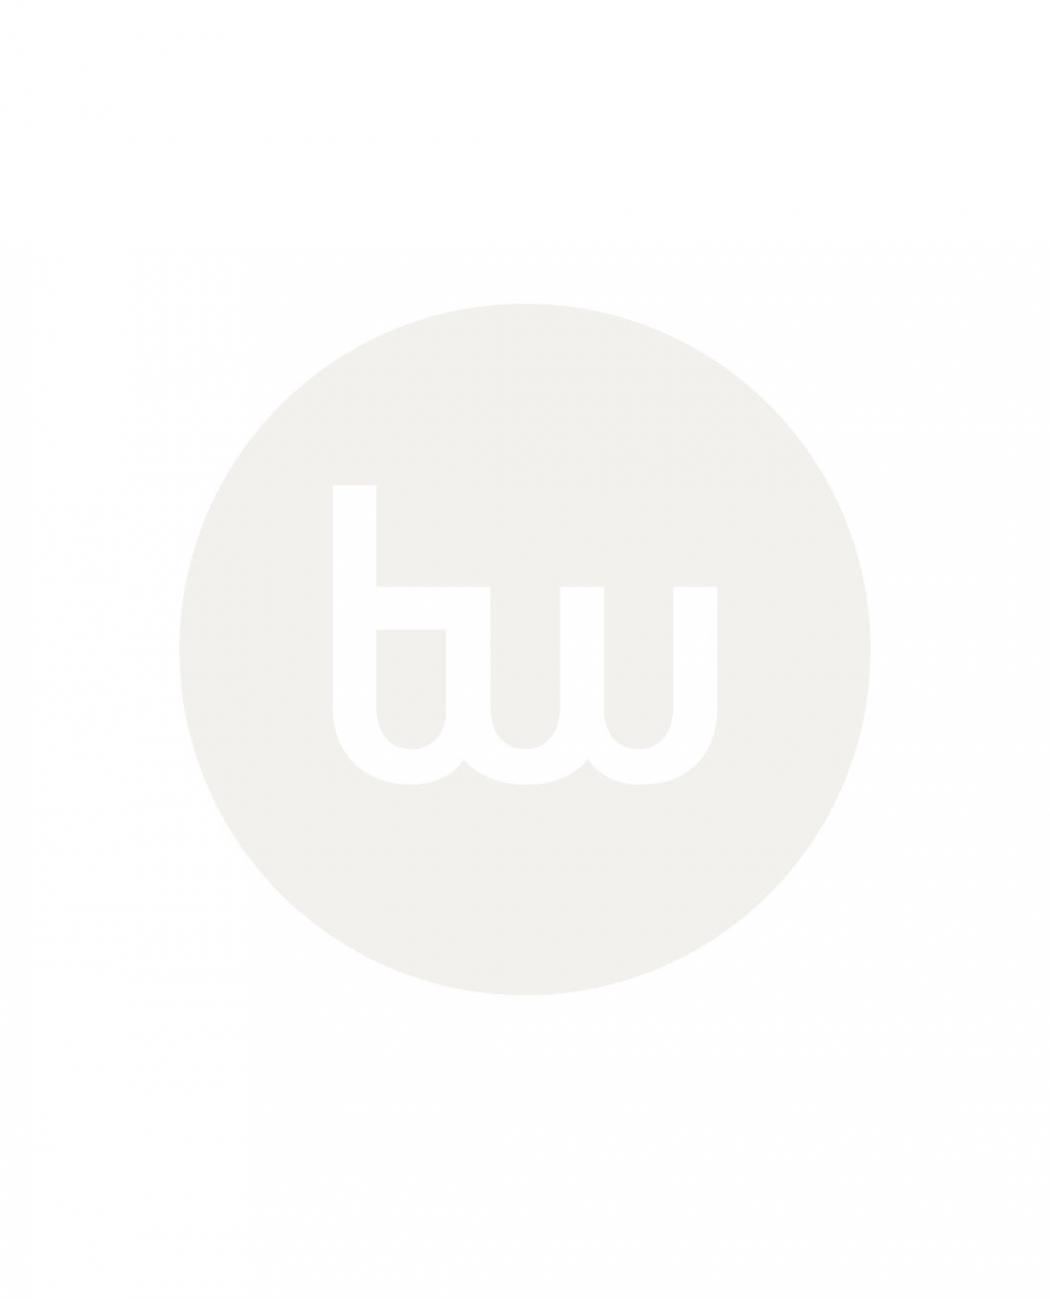 Oakley SI Ballistic M-Frame ALPHA Tan / Photochromic - TACWRK